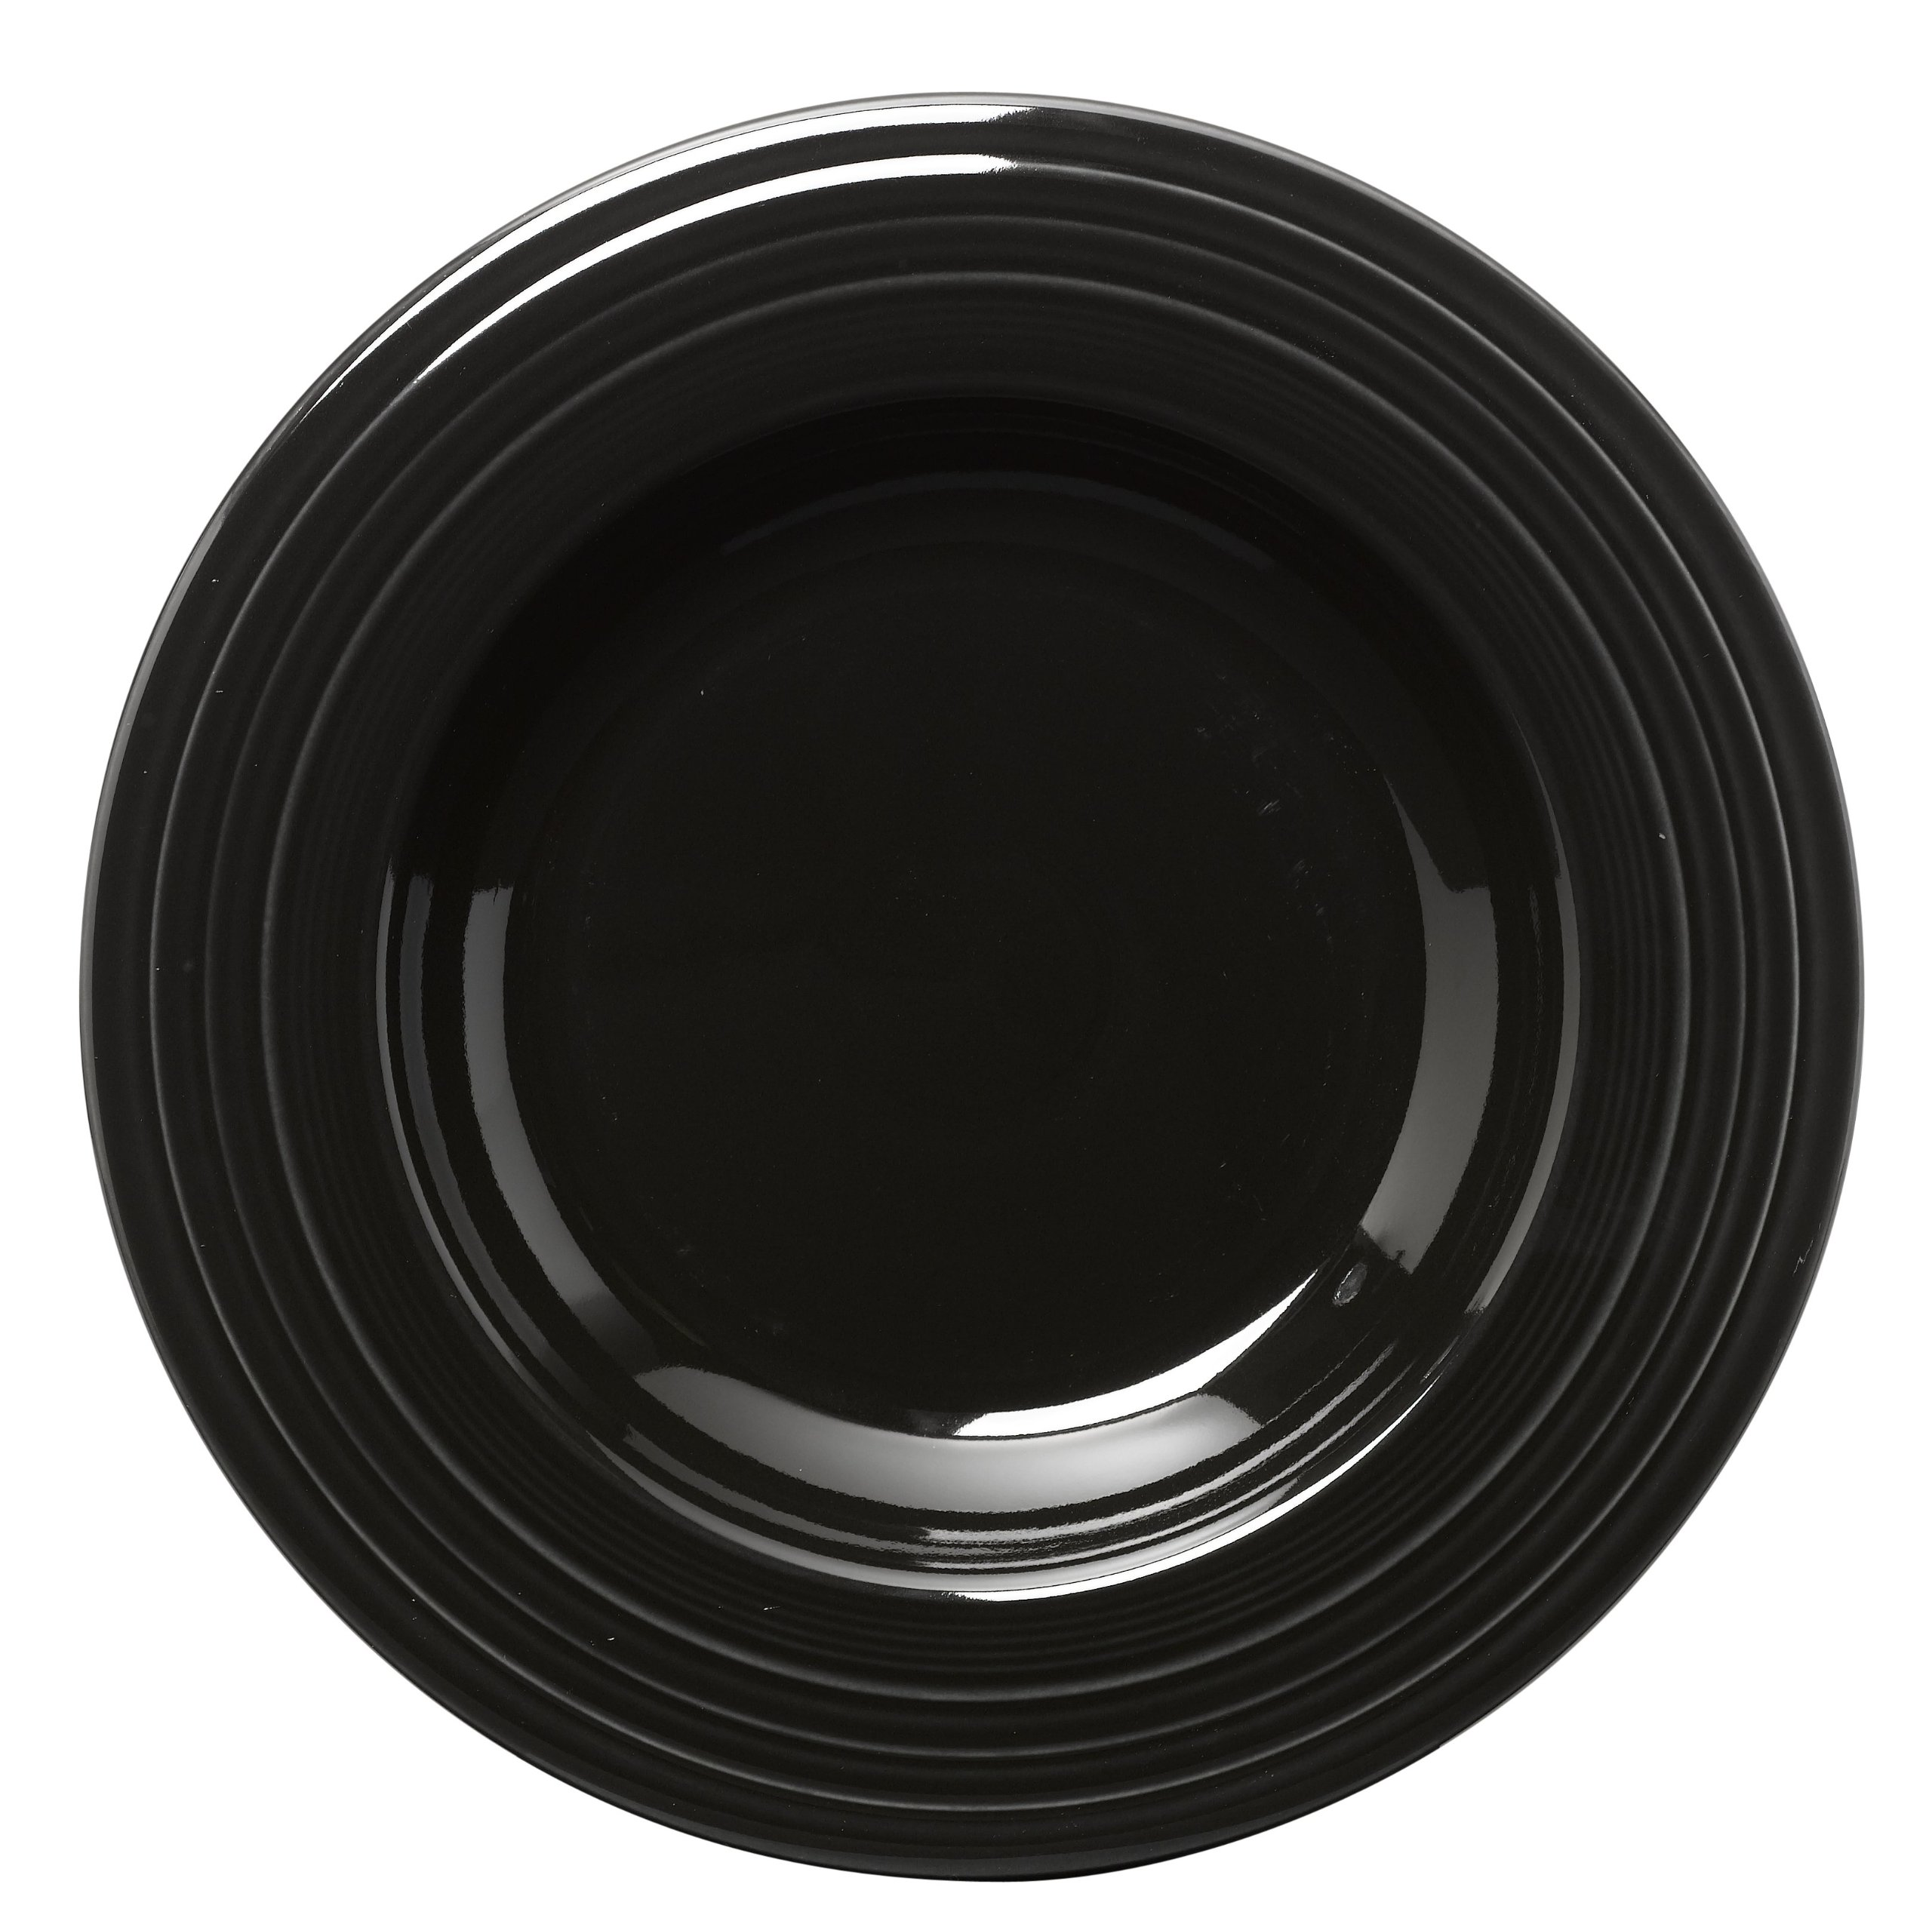 Fiesta 12-Inch Pasta Bowl, Black